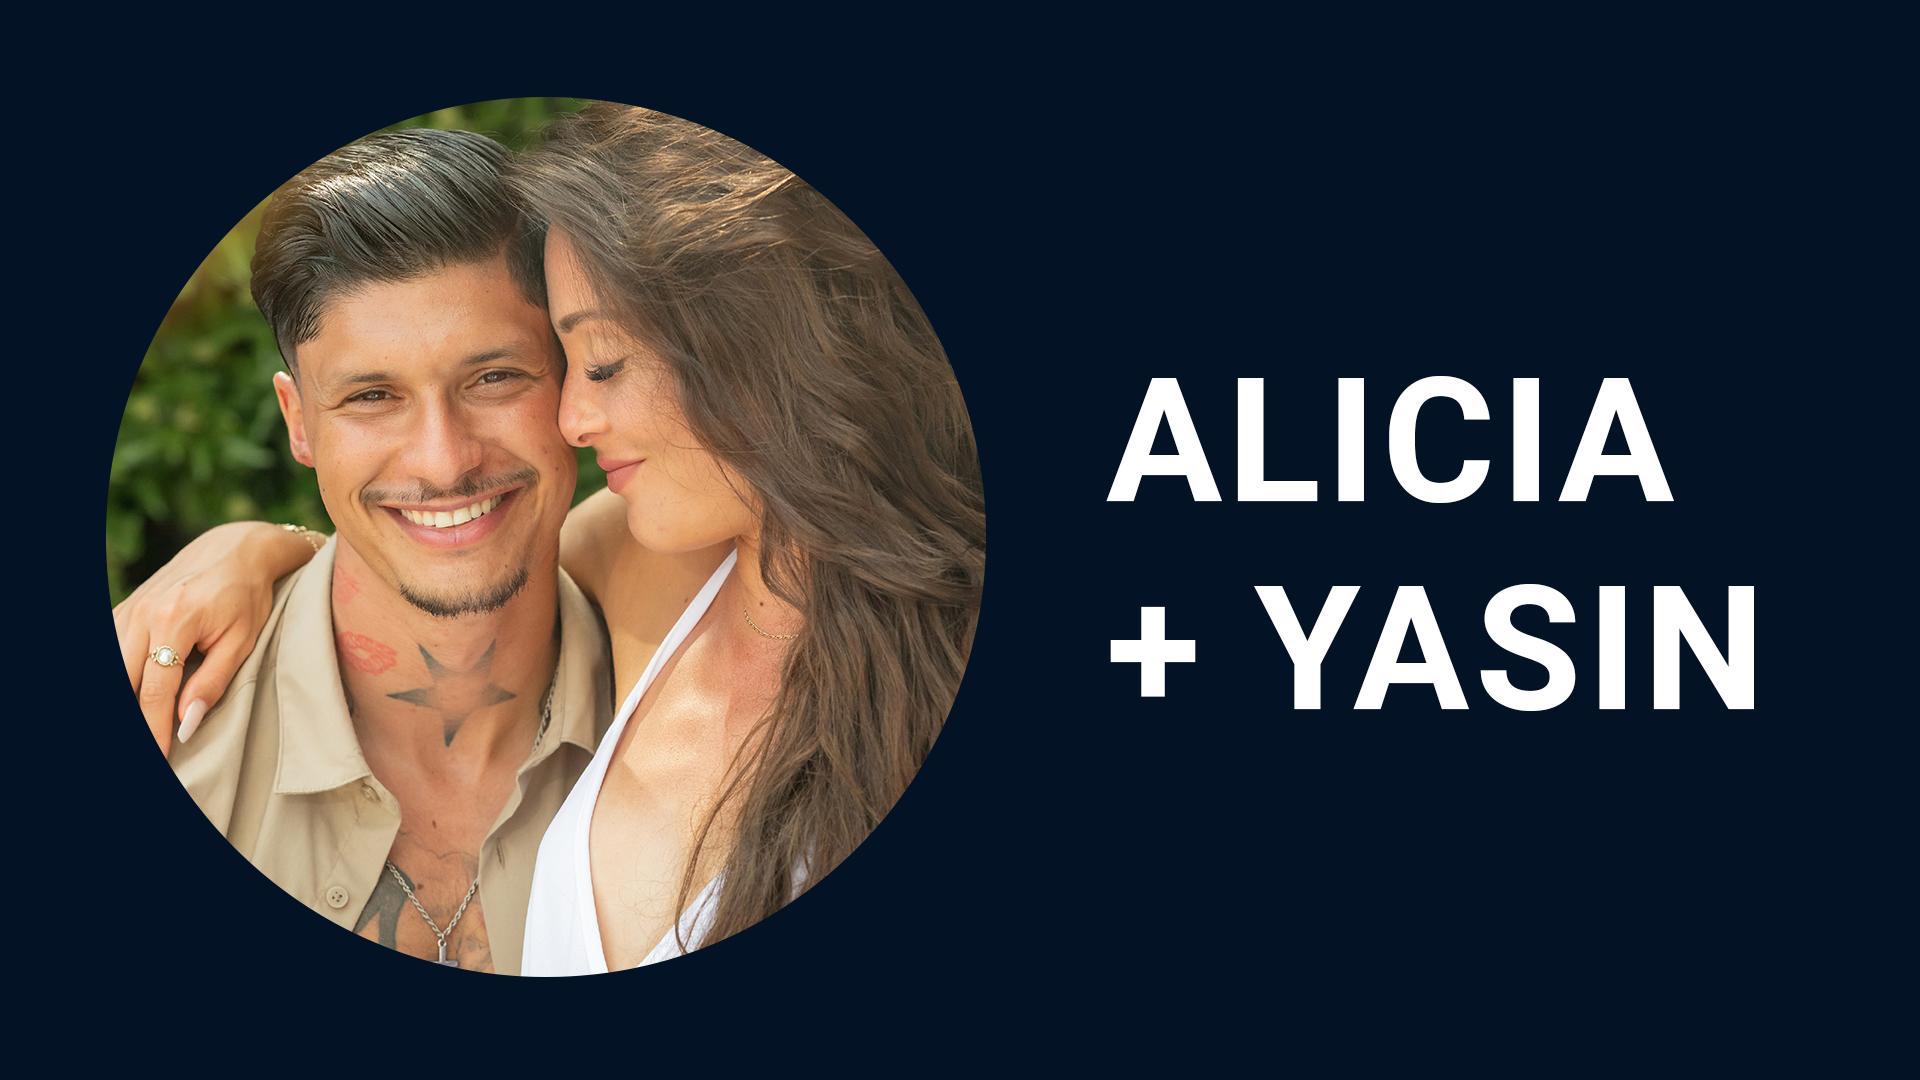 Alicia + Yasin